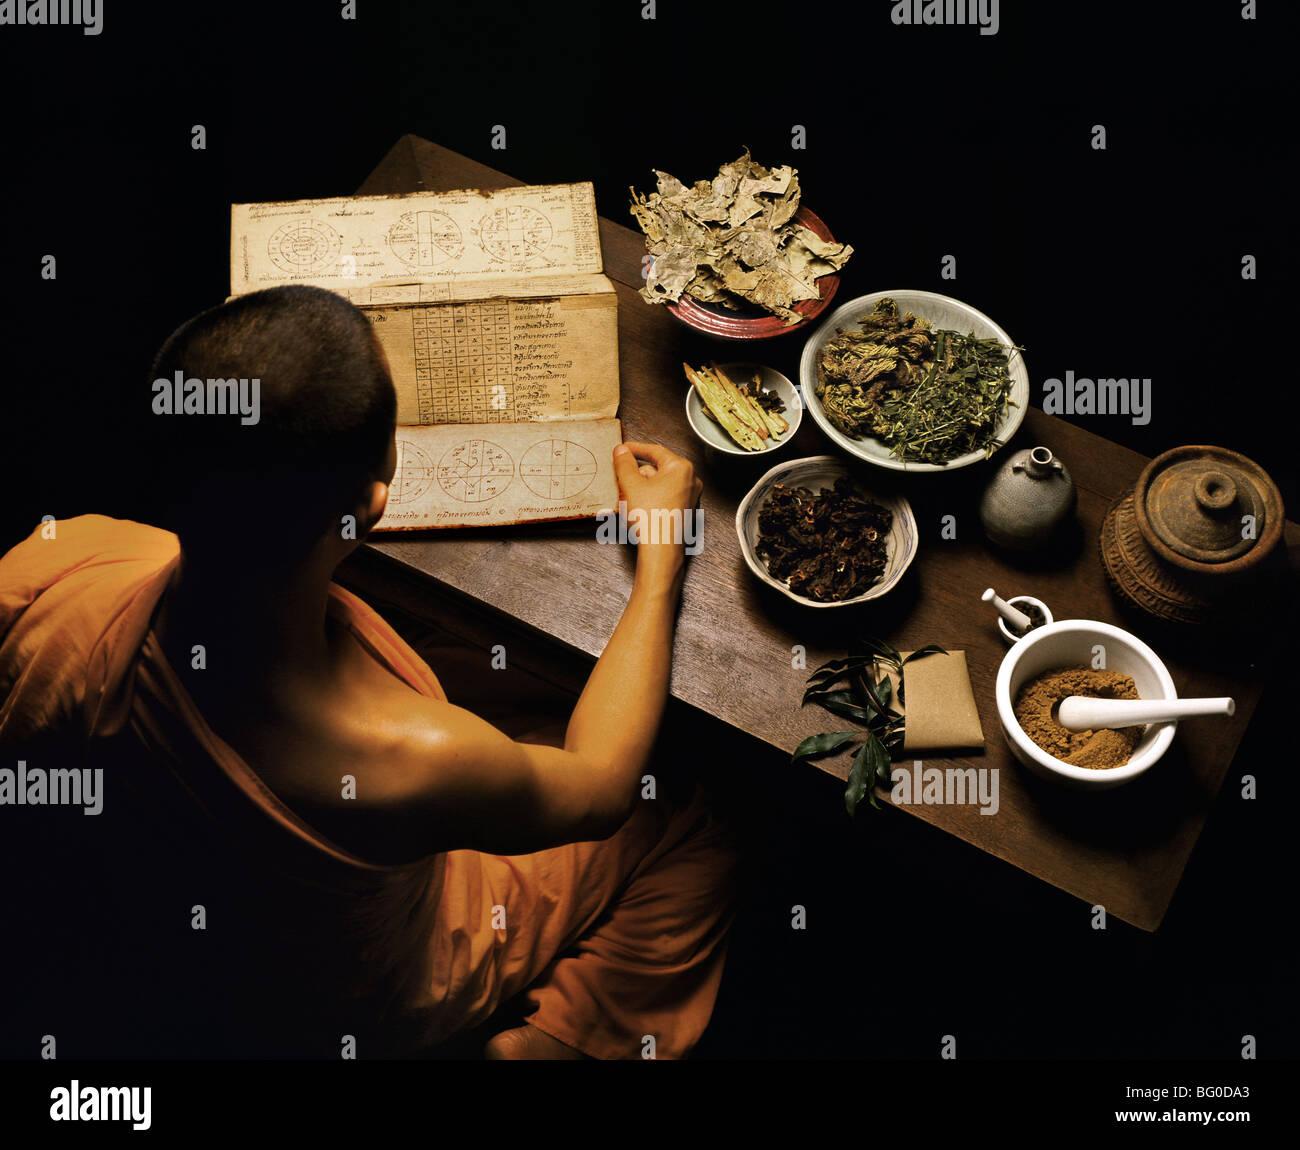 Thai monk preparing herbal medicines, Thailand, Southeast Asia, Asia - Stock Image